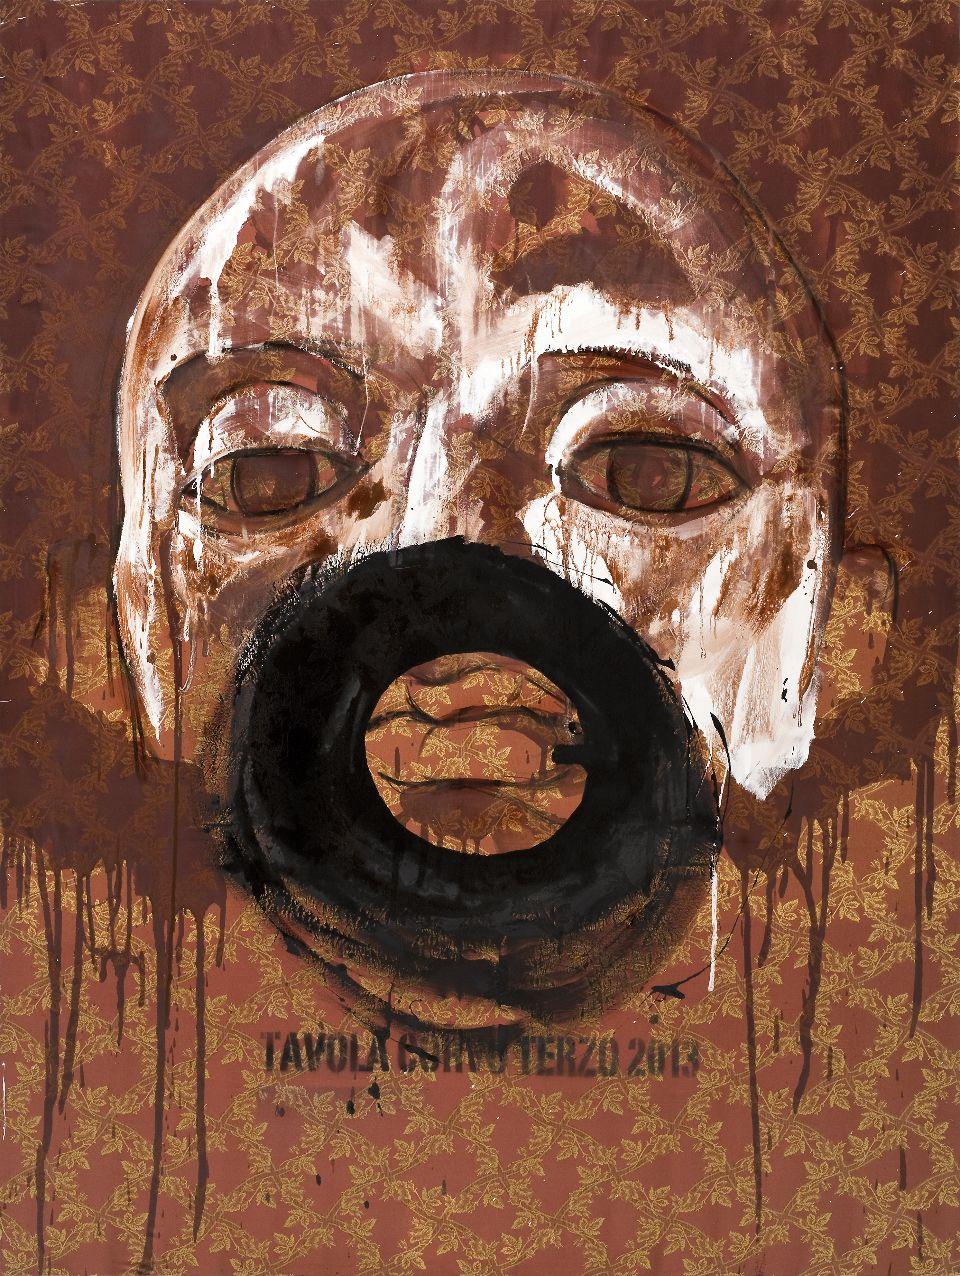 Roberto Coda Zabetta, Tavola Corvo Terzo, 2013, smalto e resine su tessuto, cm 200x150